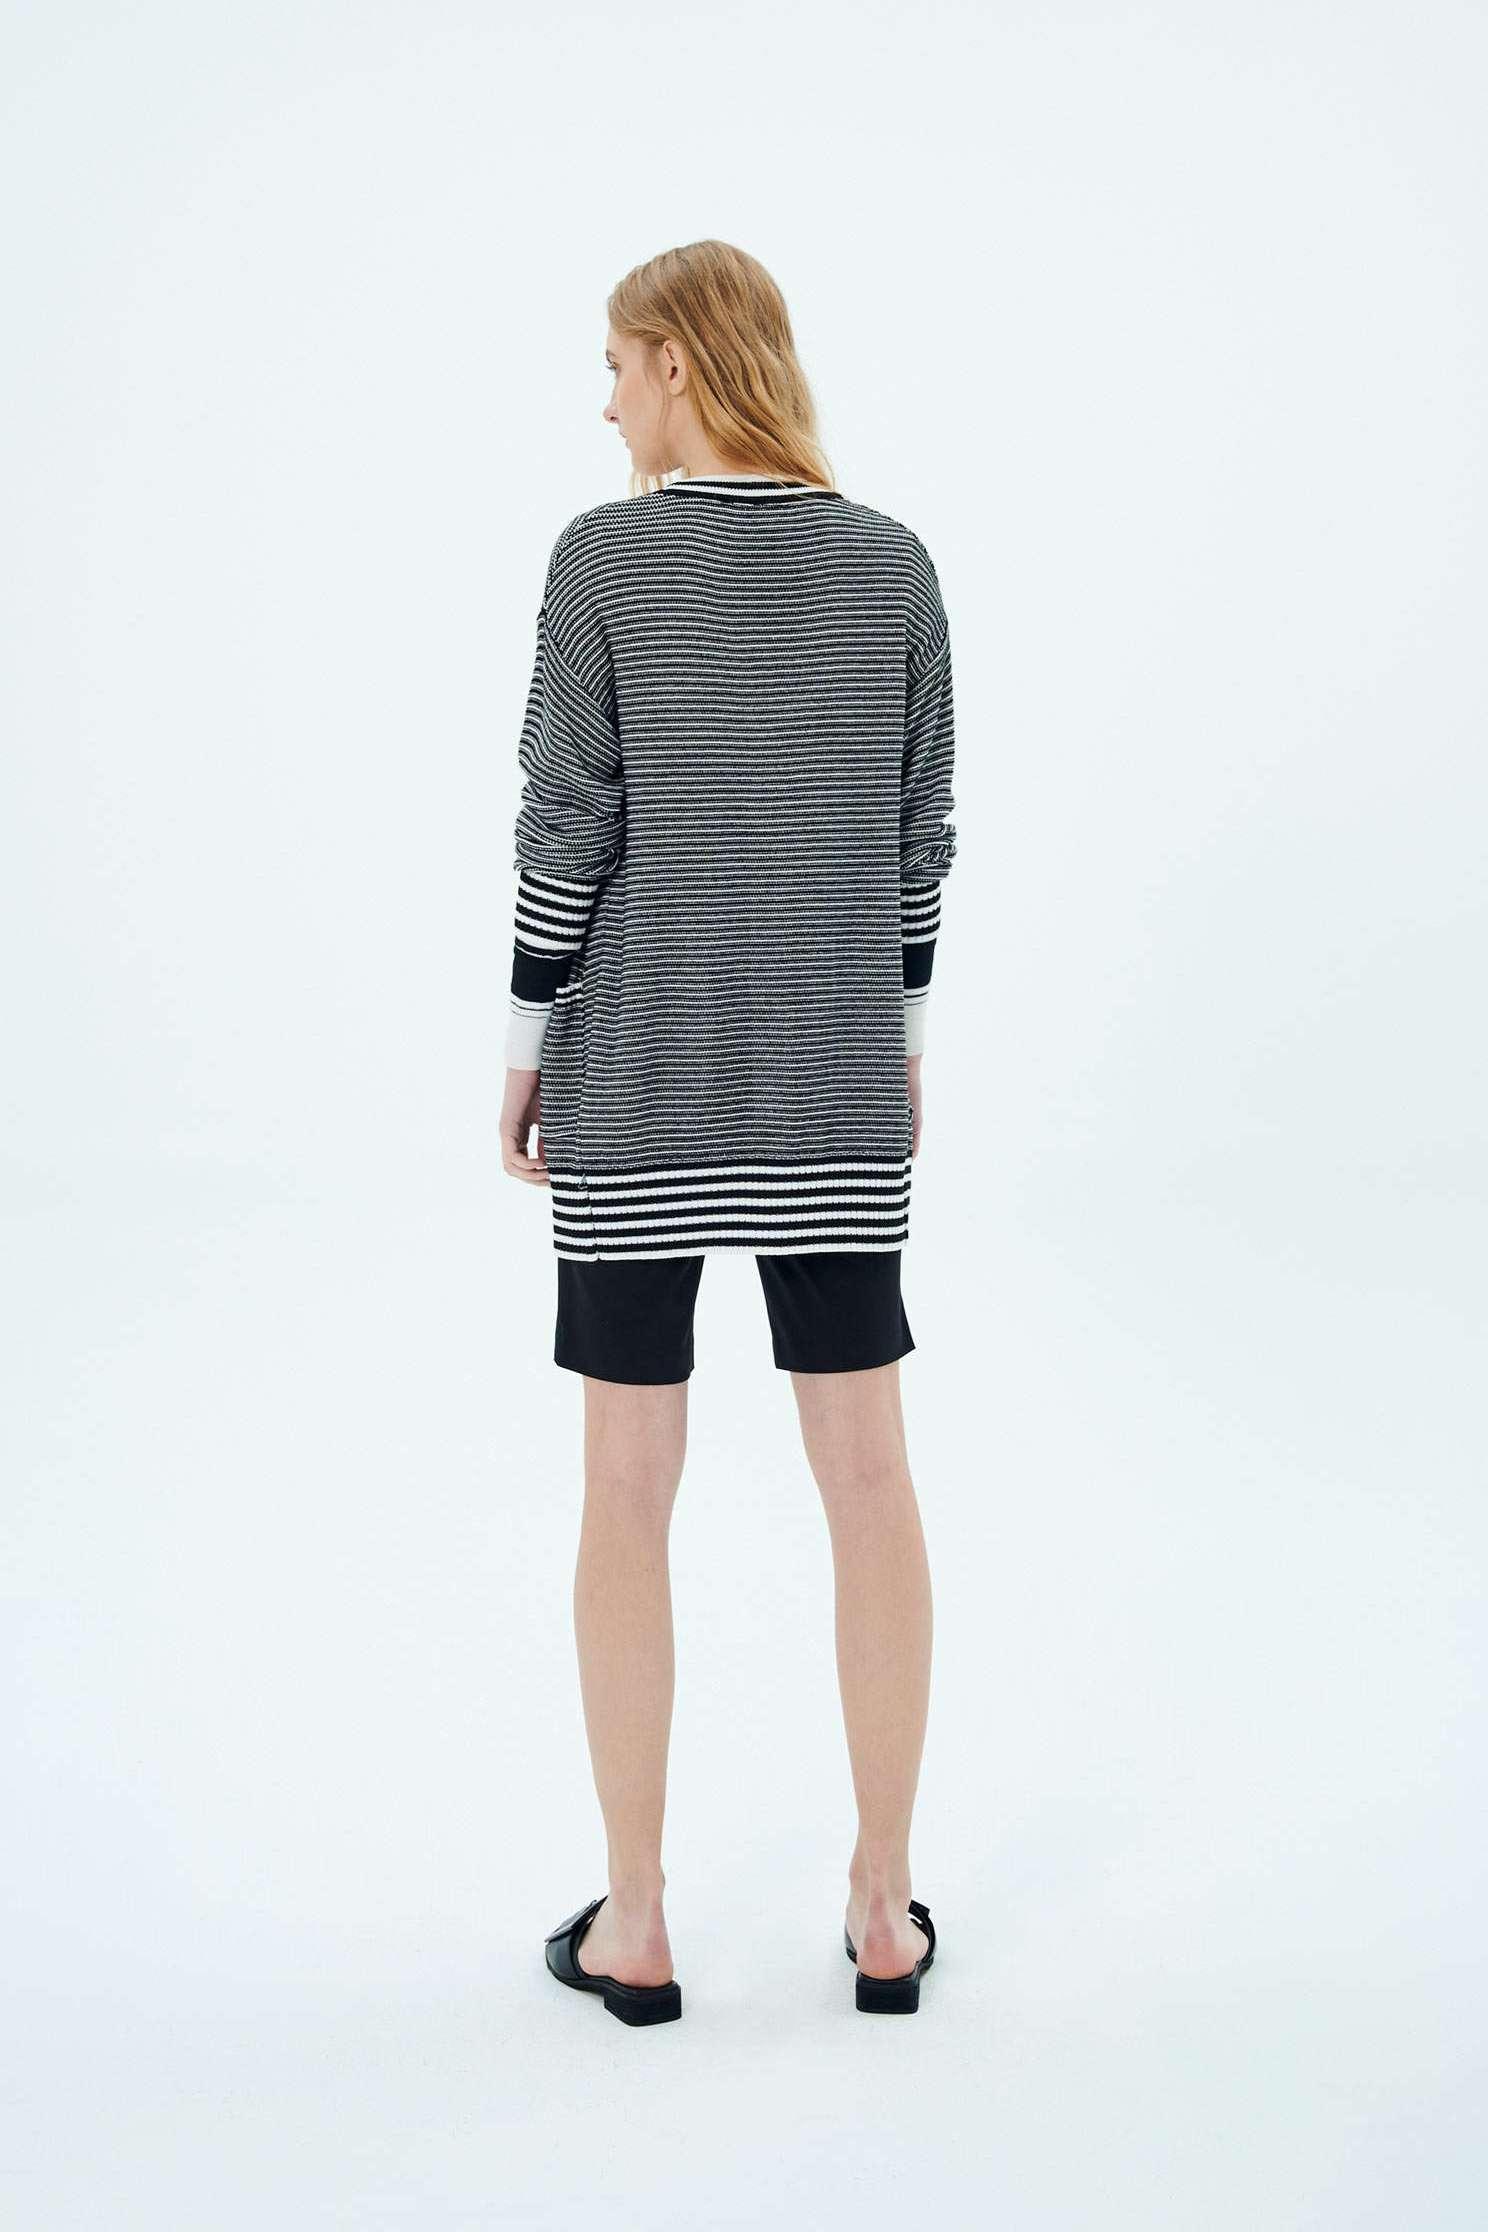 gradual striped knitted jacket,Outerwear,Rayon,Season (SS) Look,Stripe,Season (AW) Look,Knitted,Knitted coats,Overcoats,Long sleeve outerwear,Black outerwear